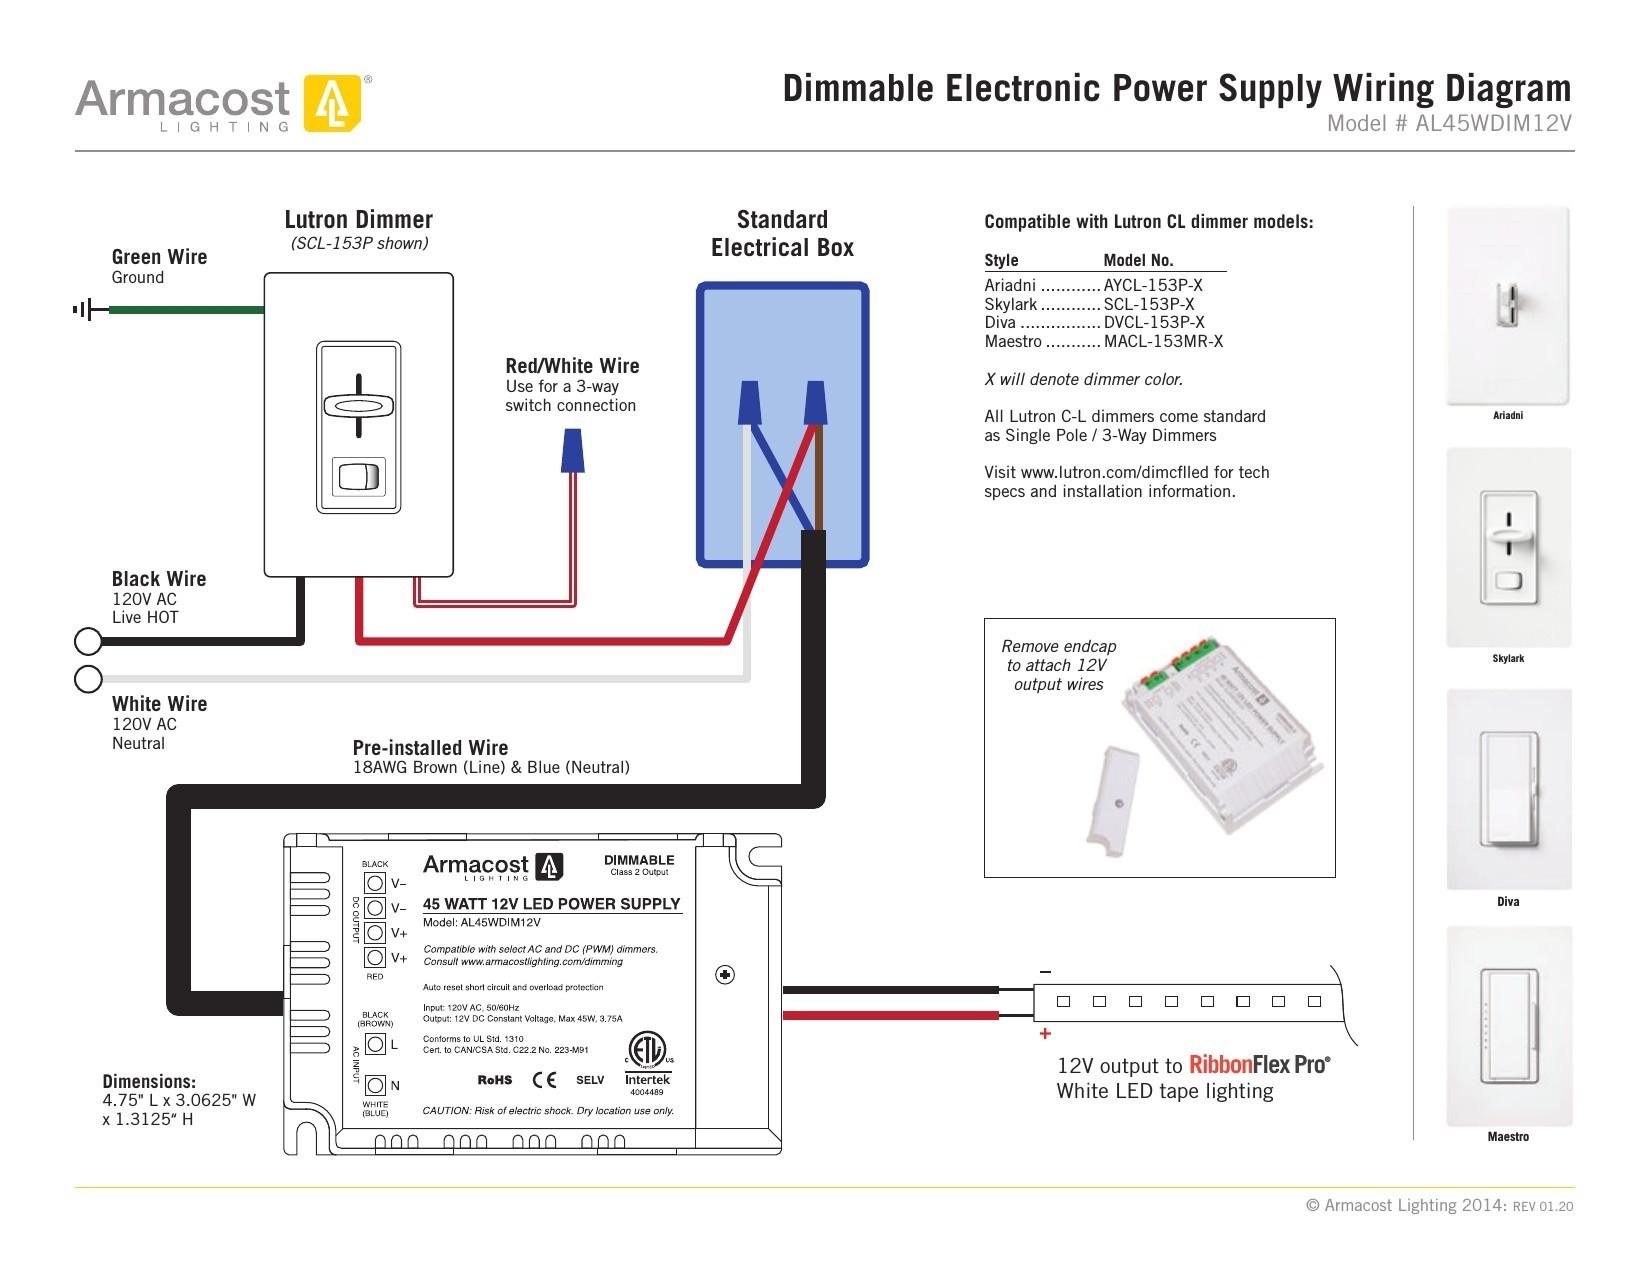 2 way dimmer wiring diagram chrysler 4 belt lutron maestro 3 free